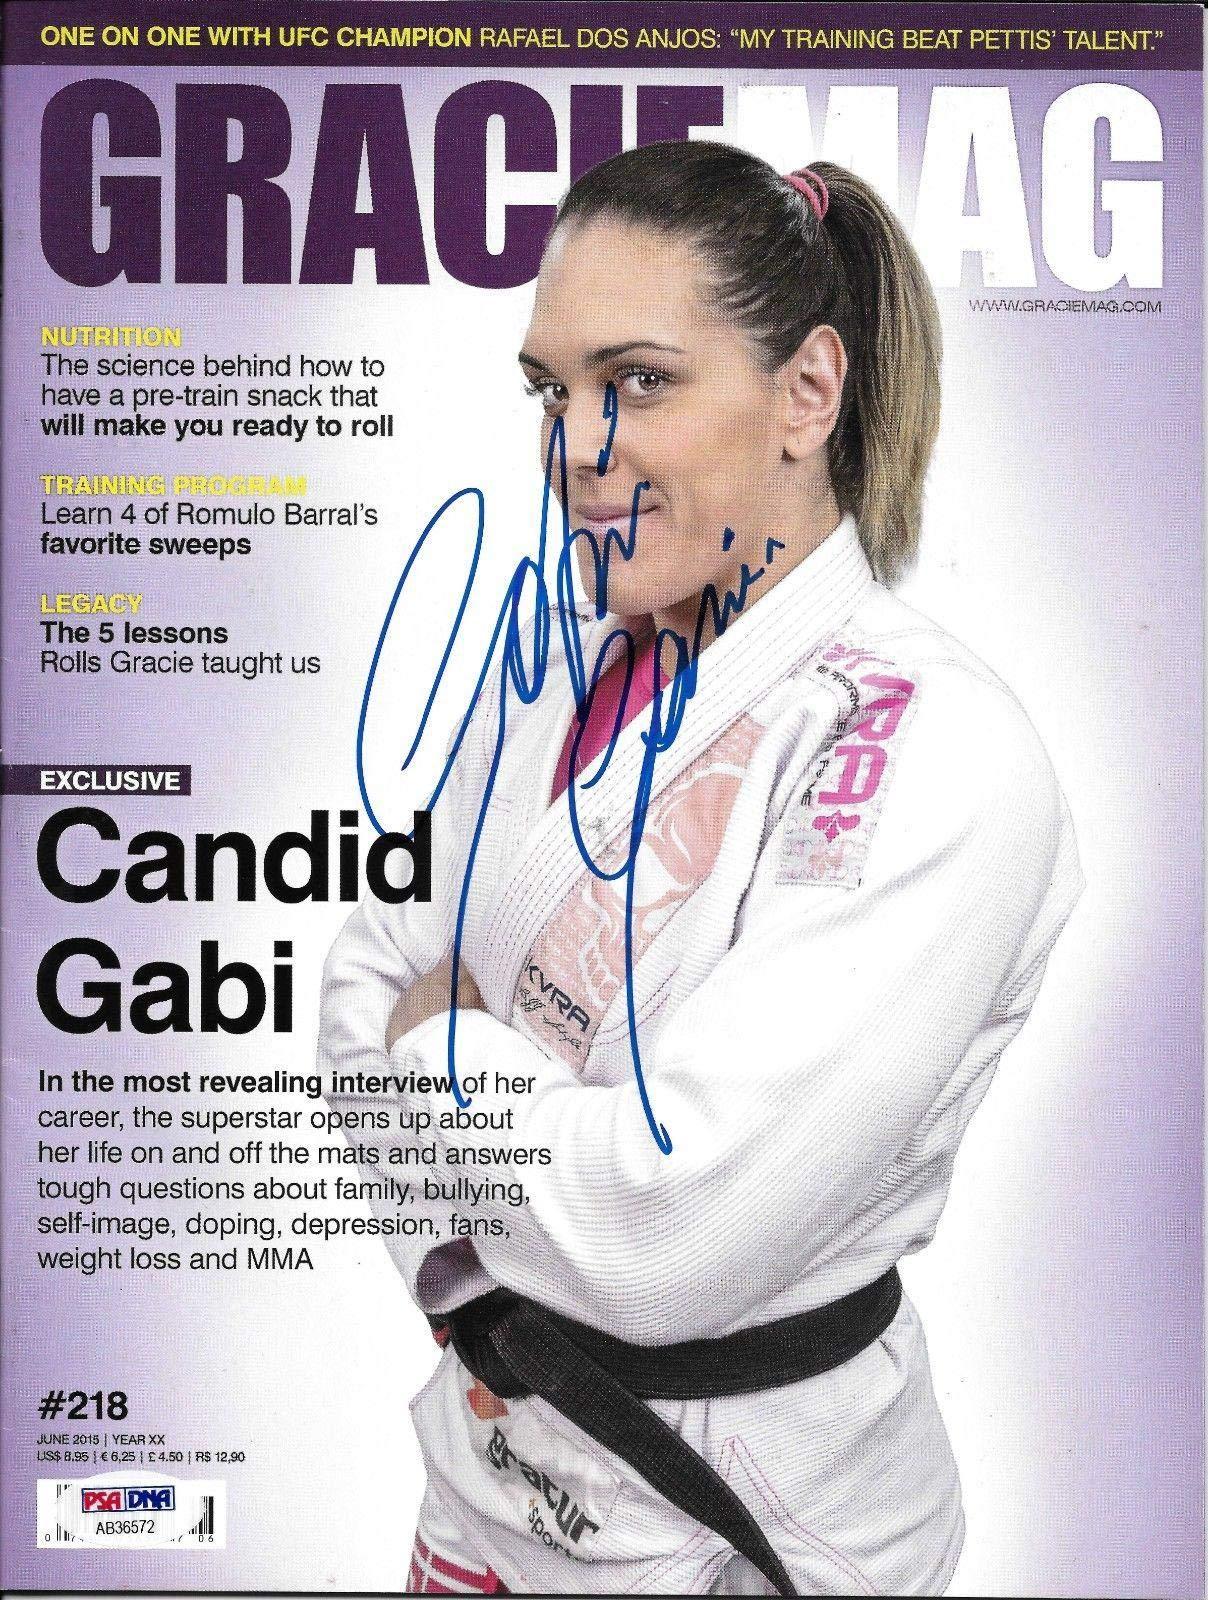 Gabi Garcia Signed June 2015 Gracie Magazine COA Rizin FF Jiu Jitsu Auto PSA/DNA Certified Autographed Sports Magazines